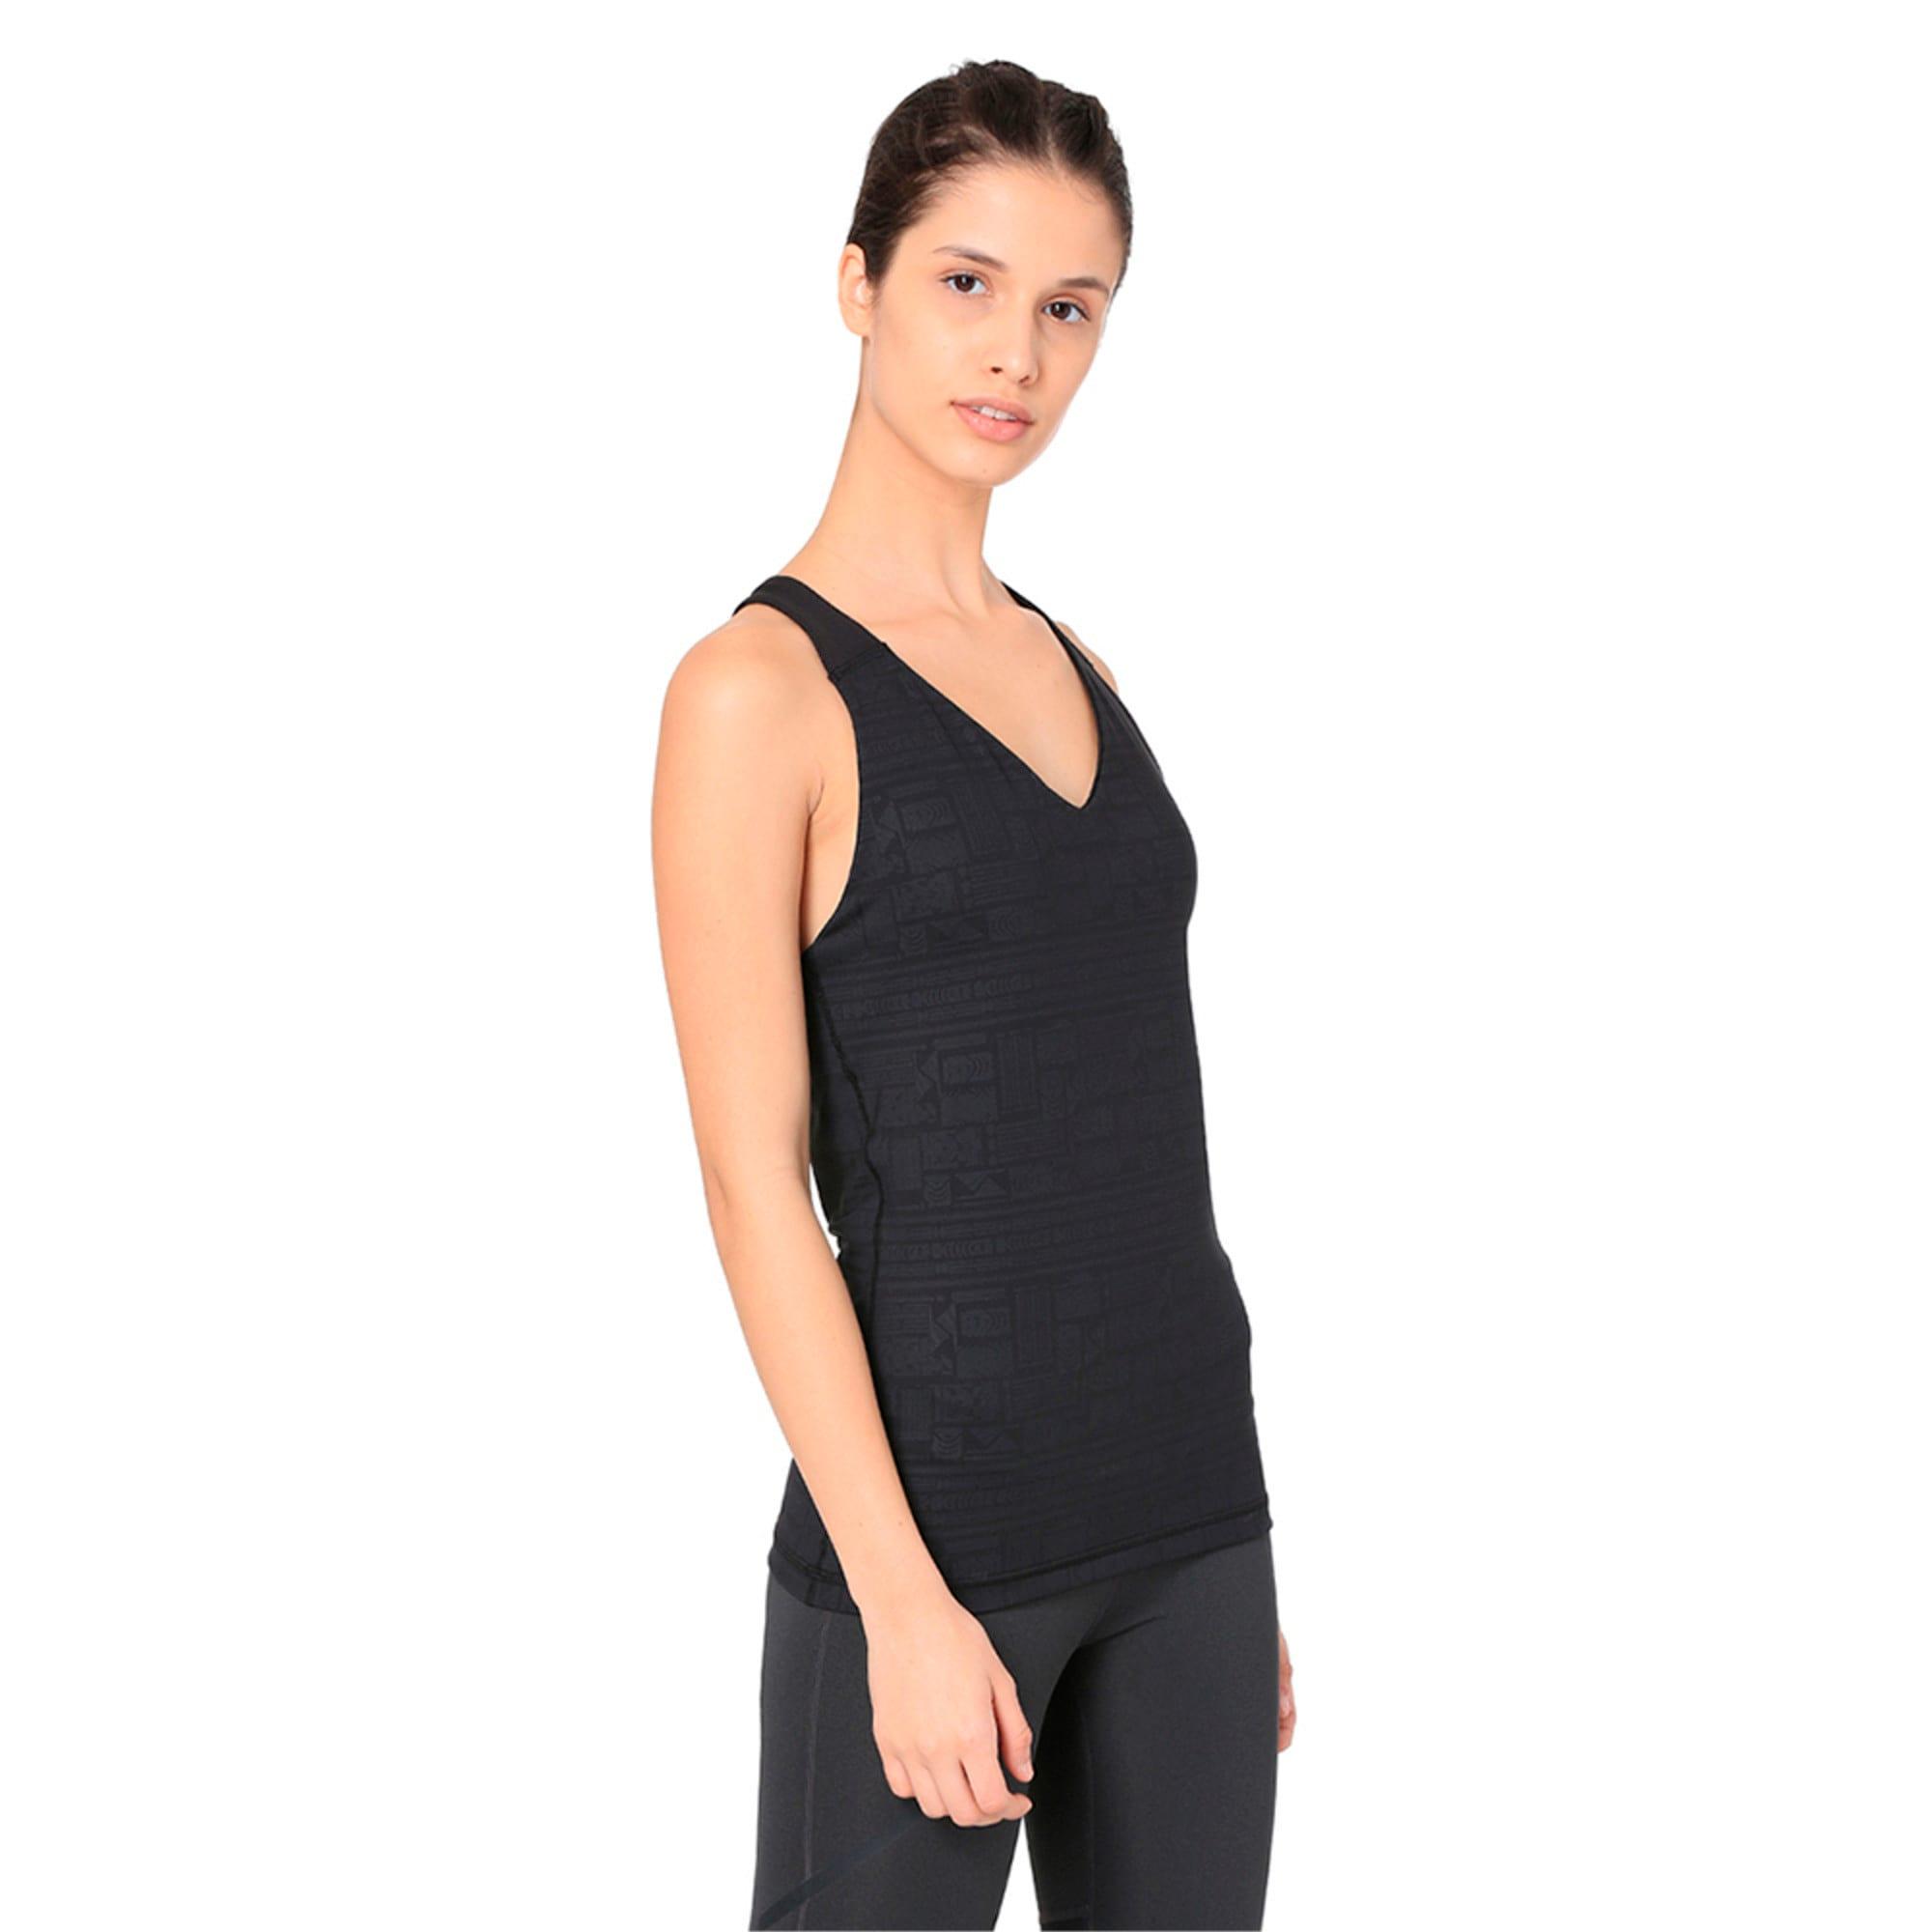 Thumbnail 1 of ALL EYES ON ME Women's Tank Top, Puma Black-Solistice gel prt, medium-IND